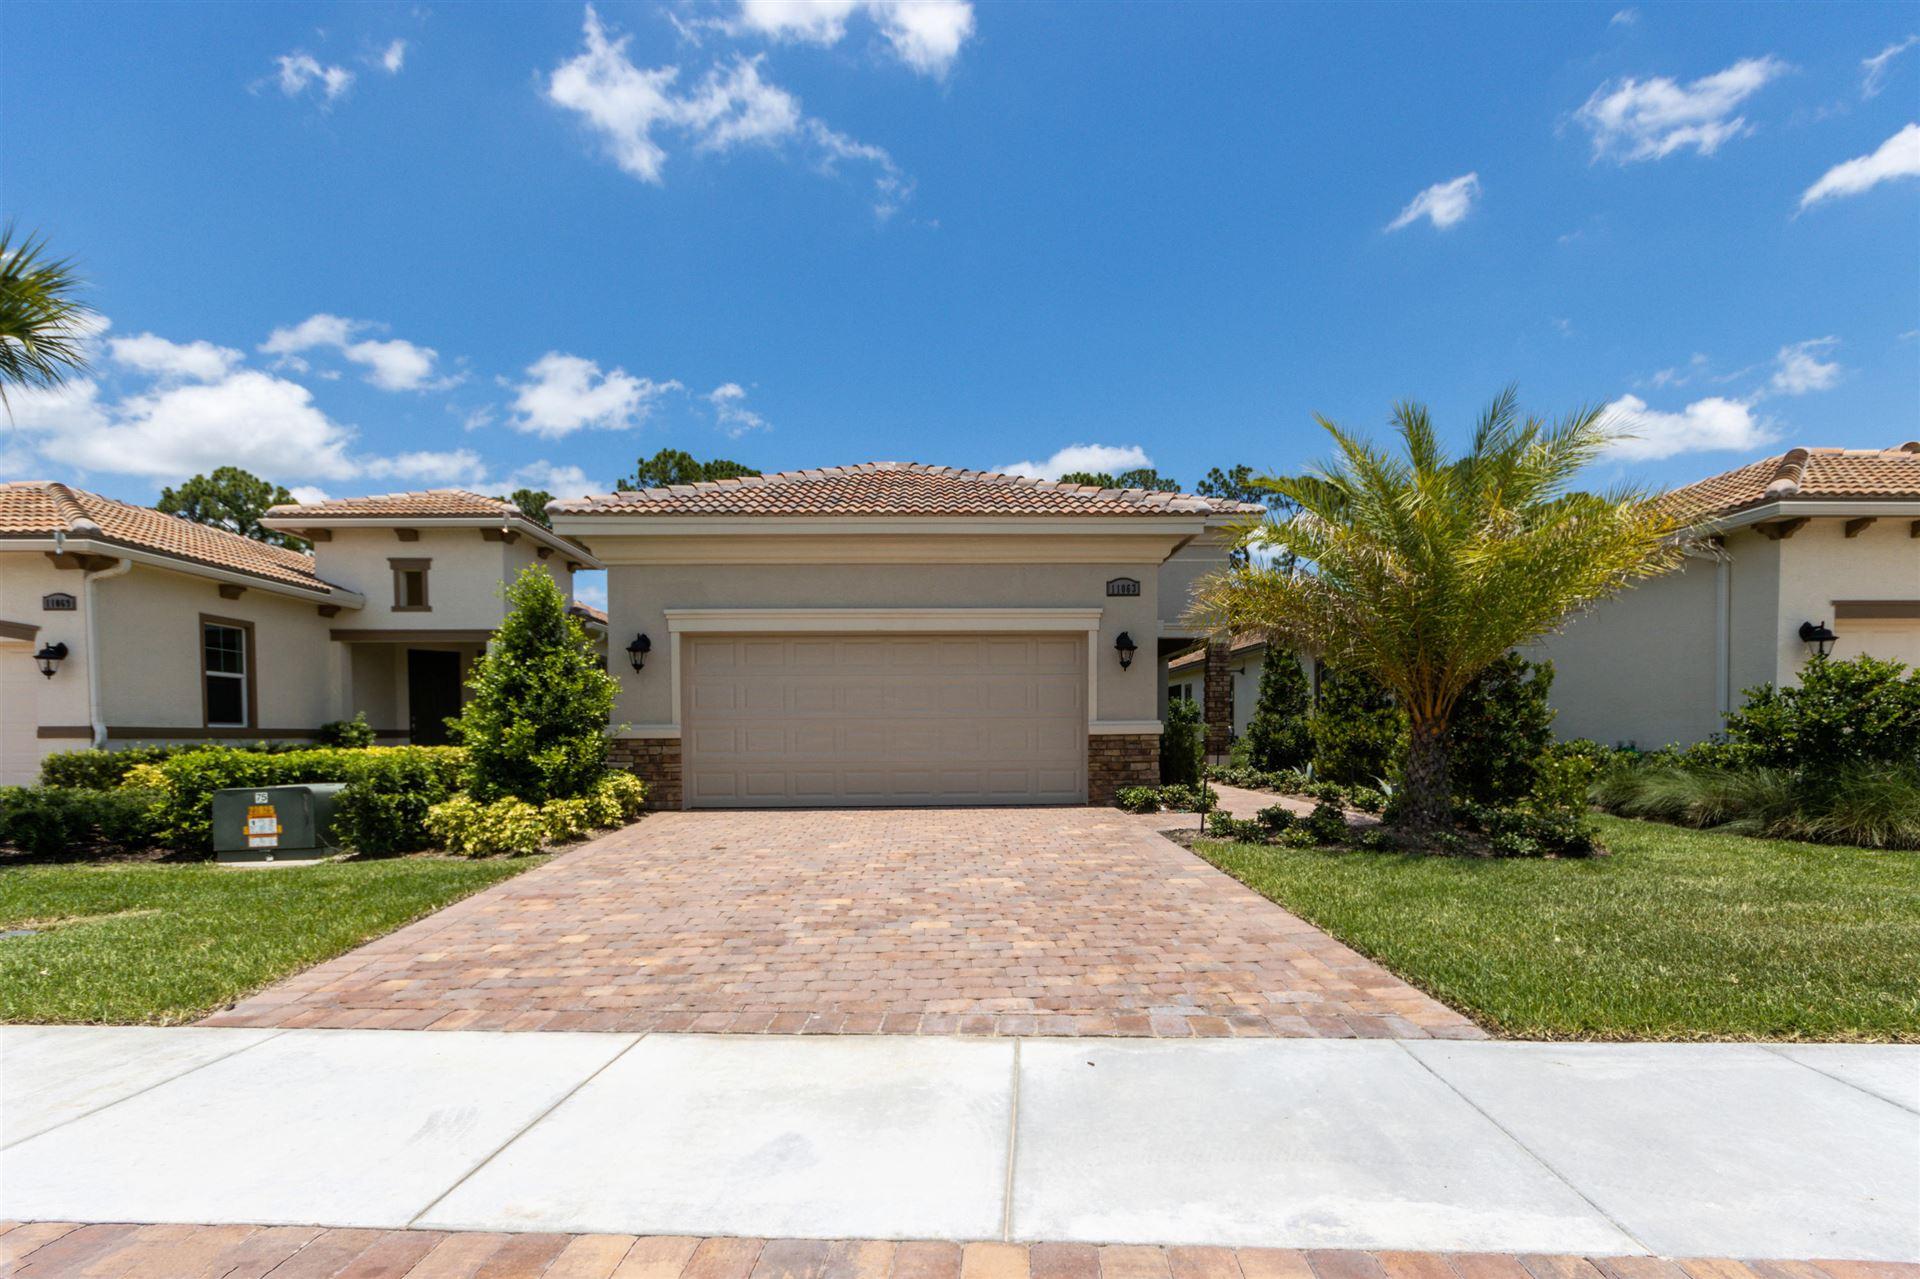 11063 SW Visconti Way, Port Saint Lucie, FL 34986 - #: RX-10633452